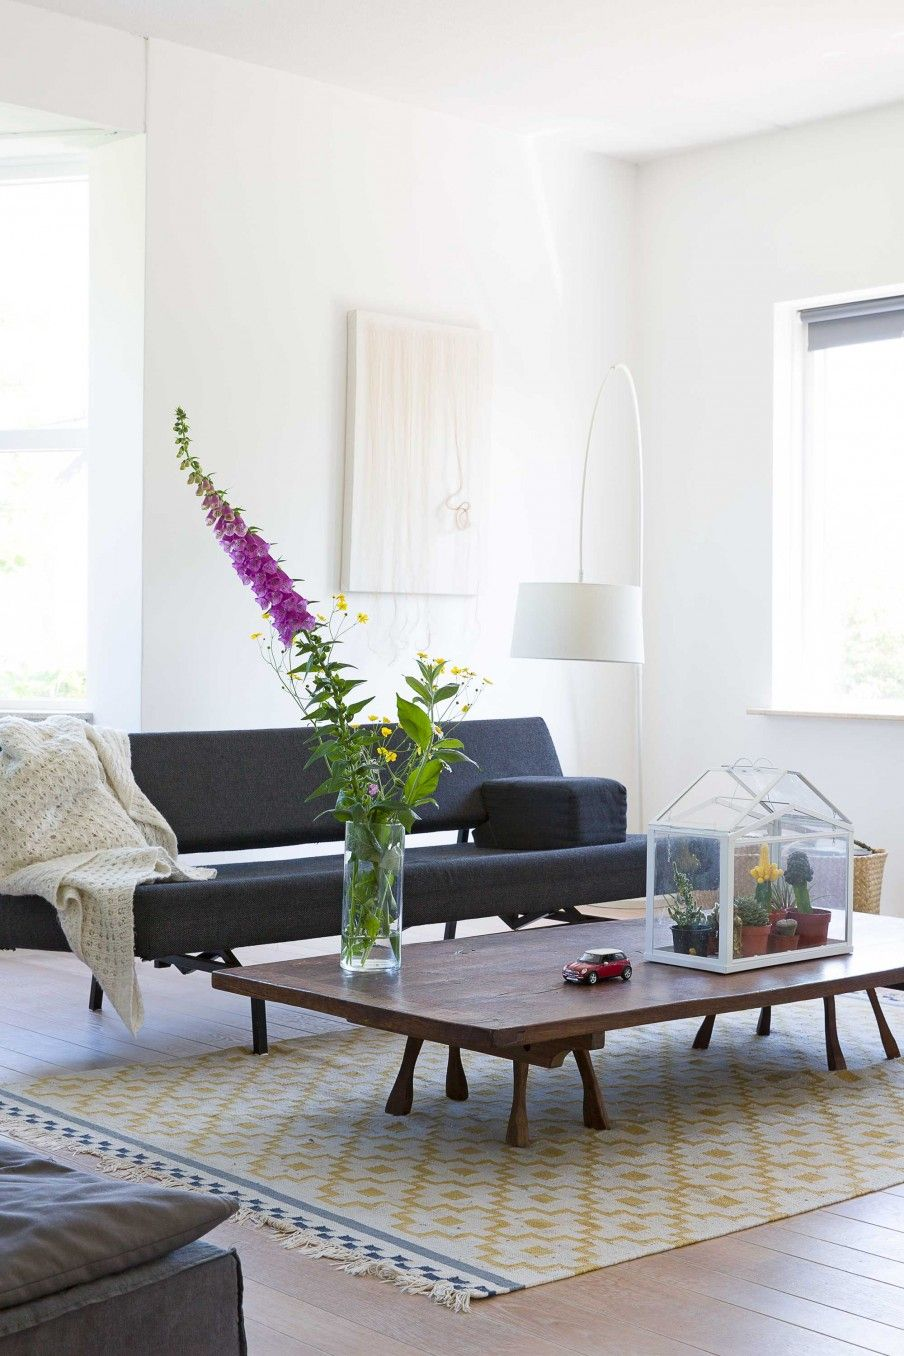 Woonkamer | Livingroom | vtwonen 09-2016 | photography: Anouk de ...